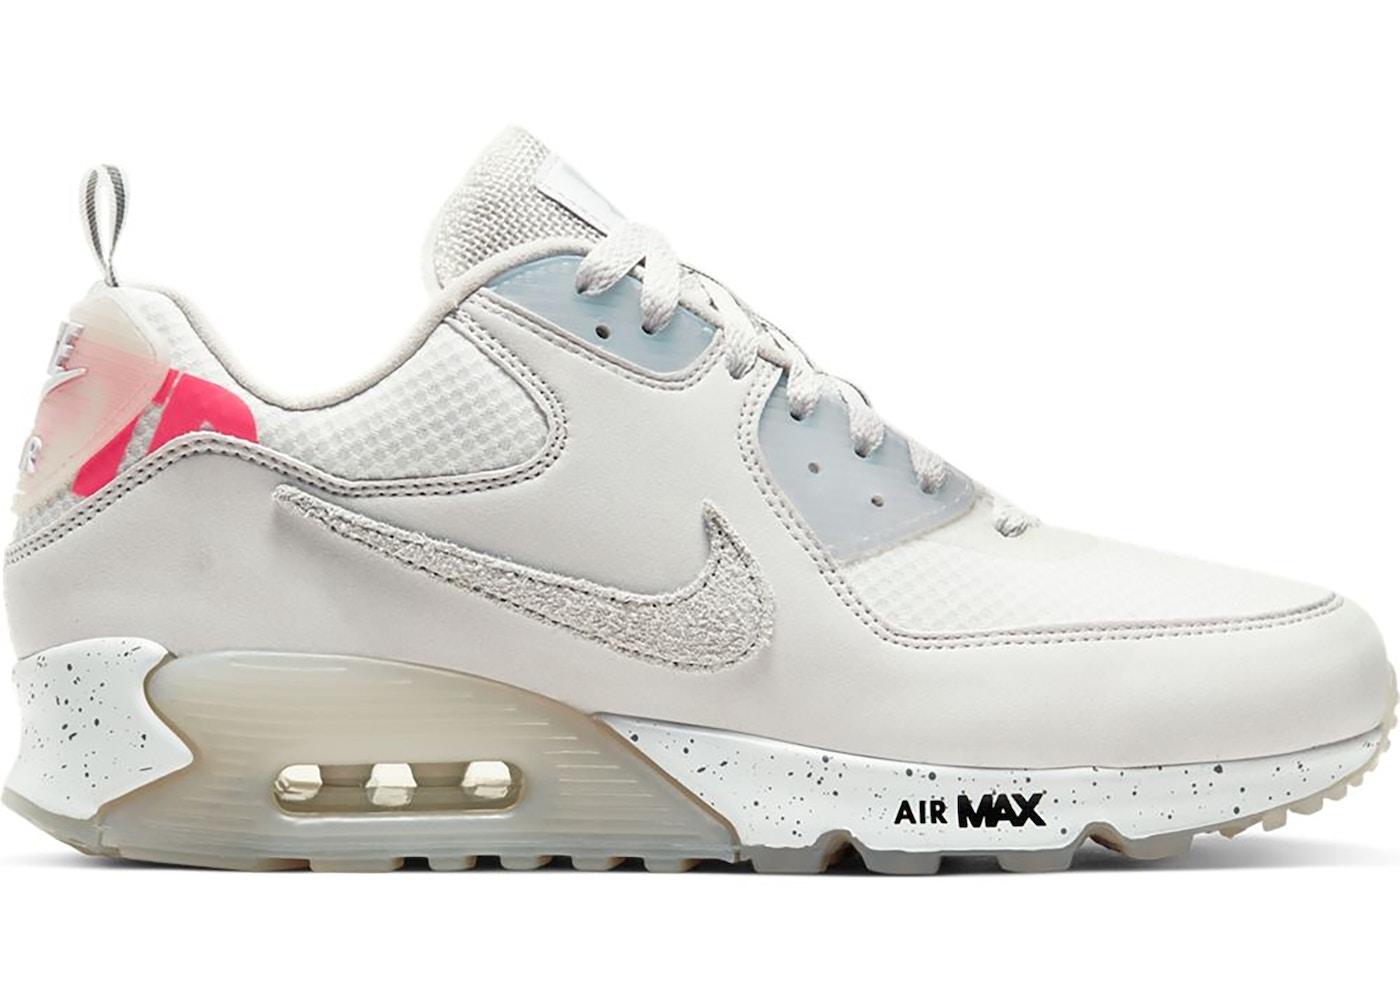 Nike Air Max 90 20 Undefeated Platinum Tint